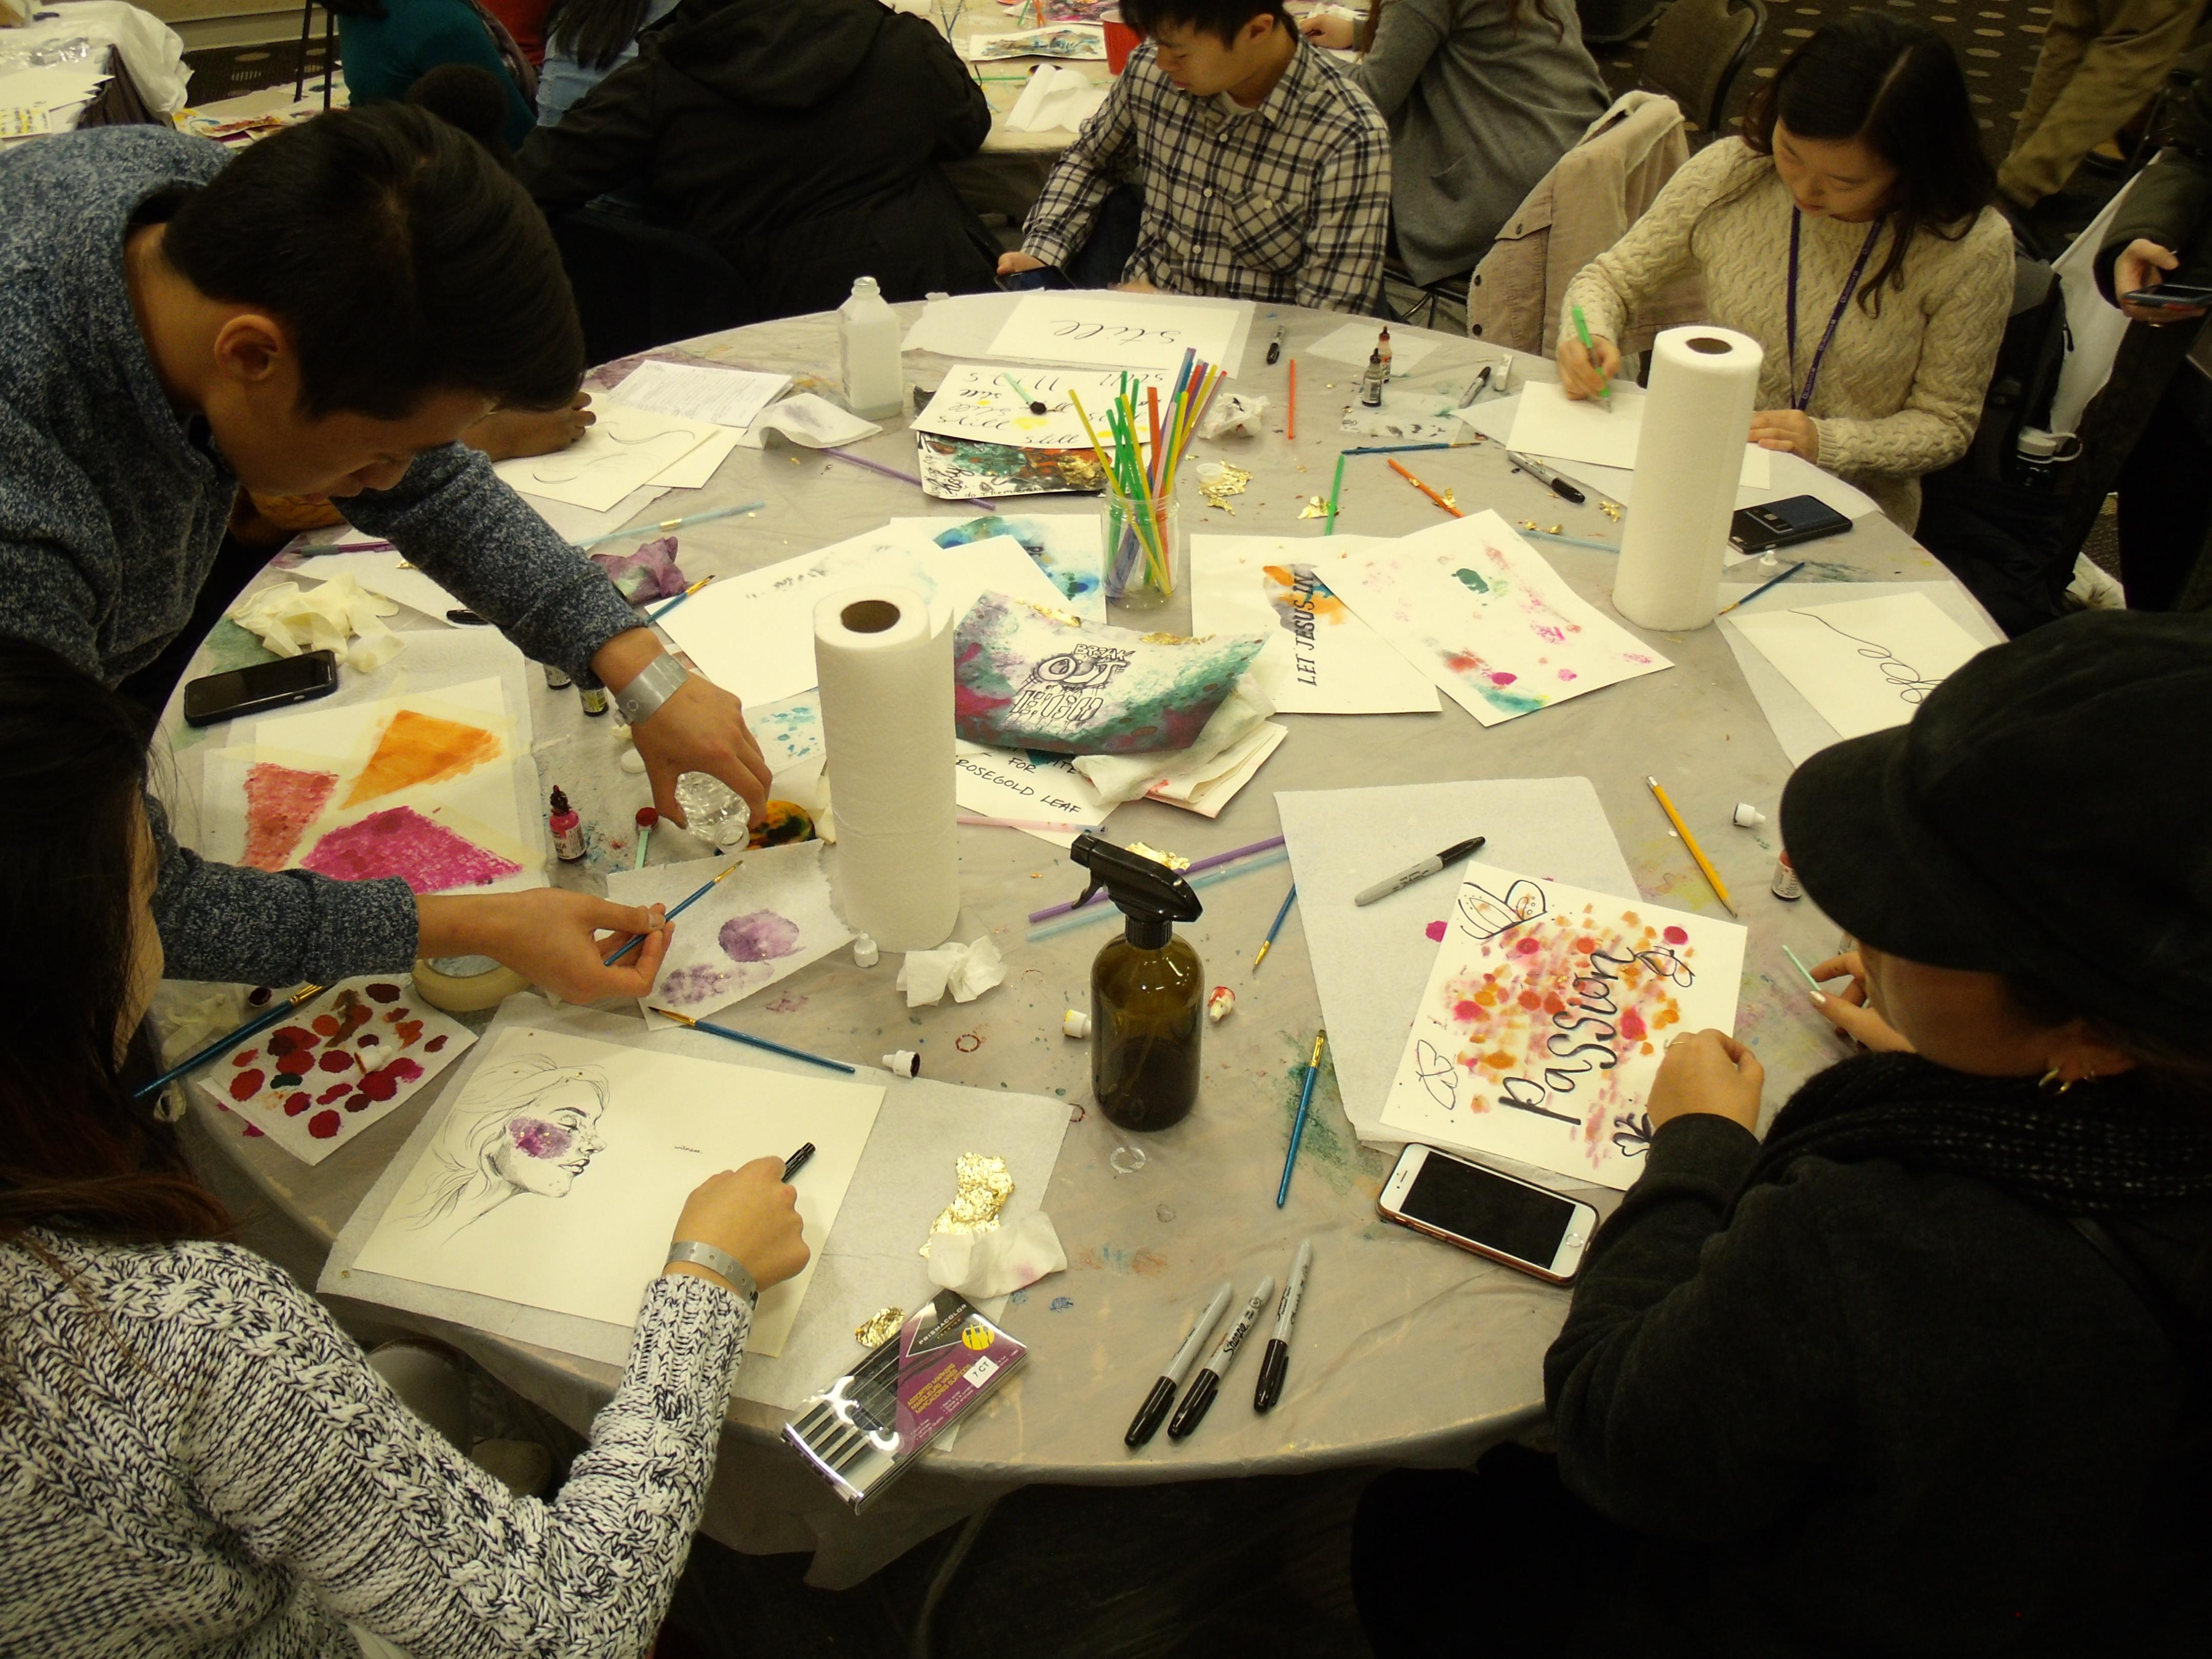 Showcasing the Gospel message through art